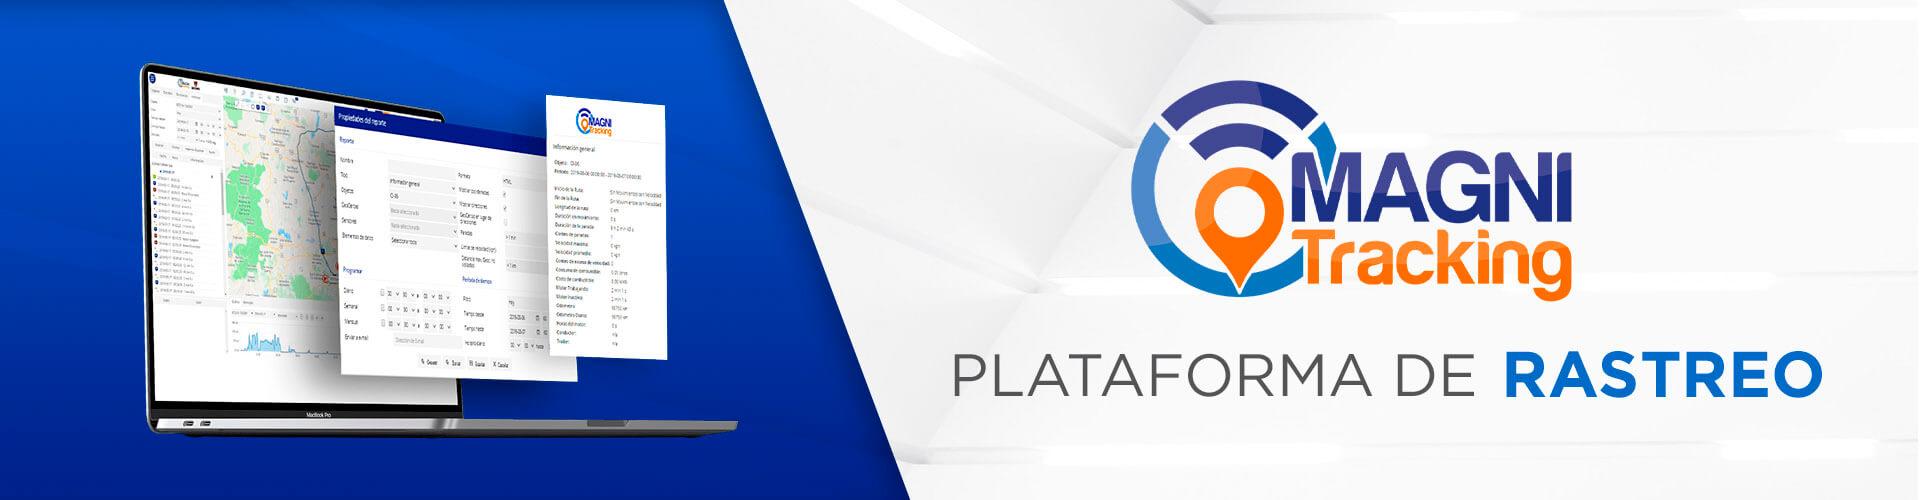 nosotros-plataforma-rastreo